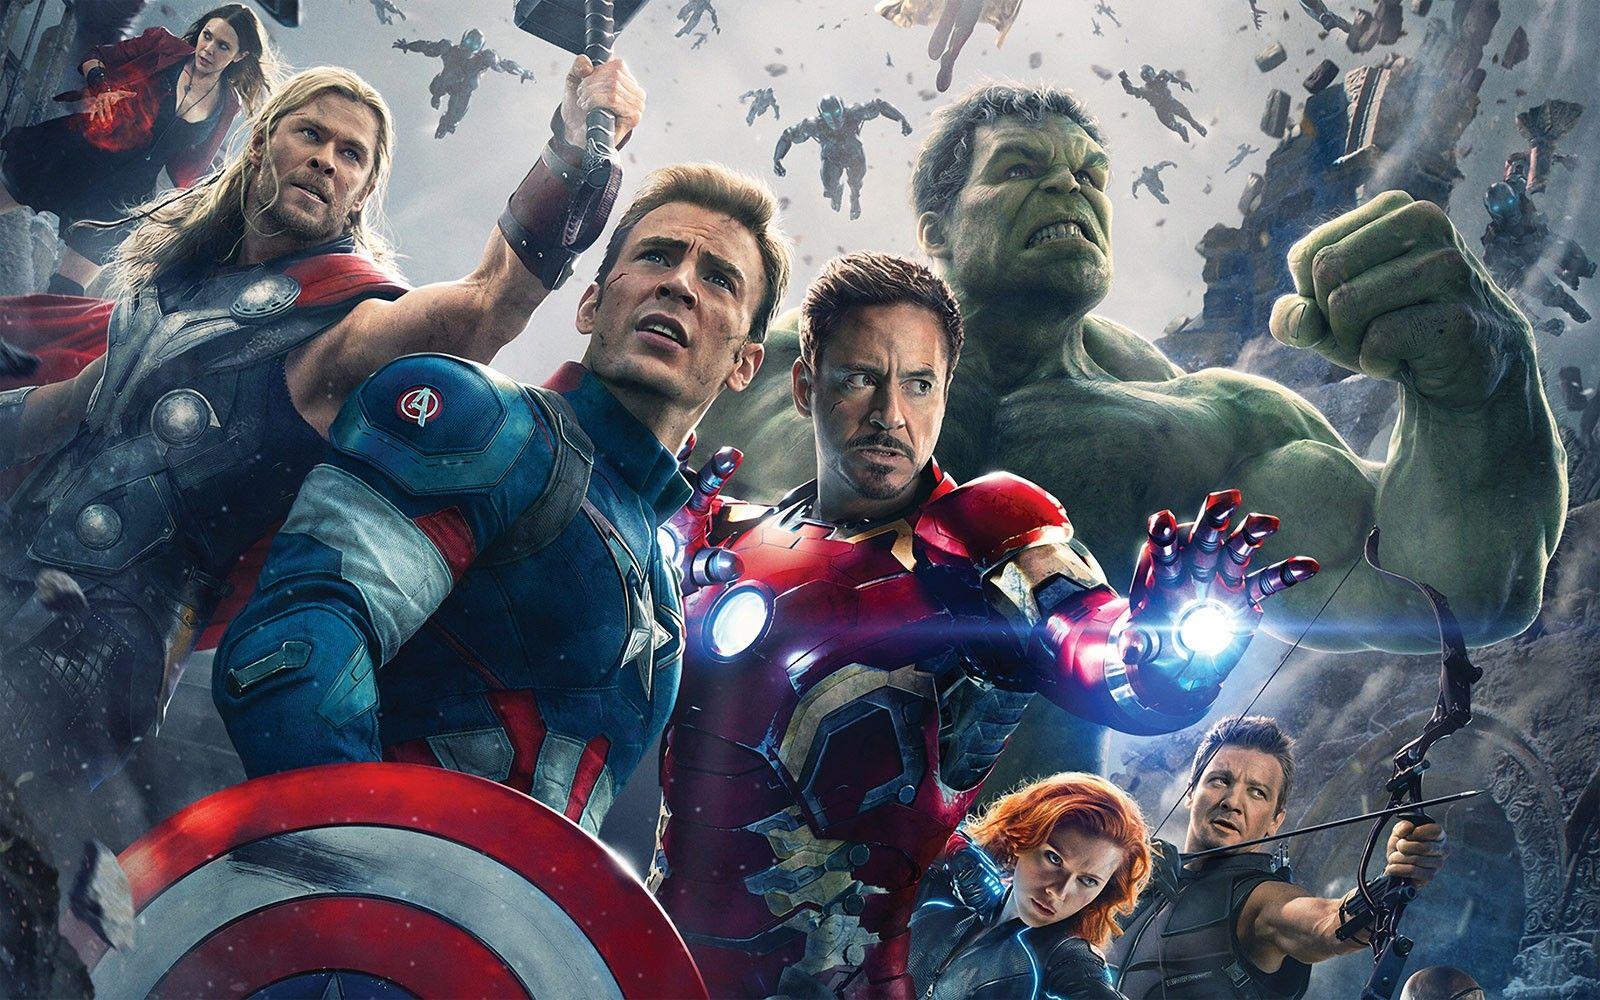 Avengers Pinterest: Avengers Age Of Ultron Wallpapers